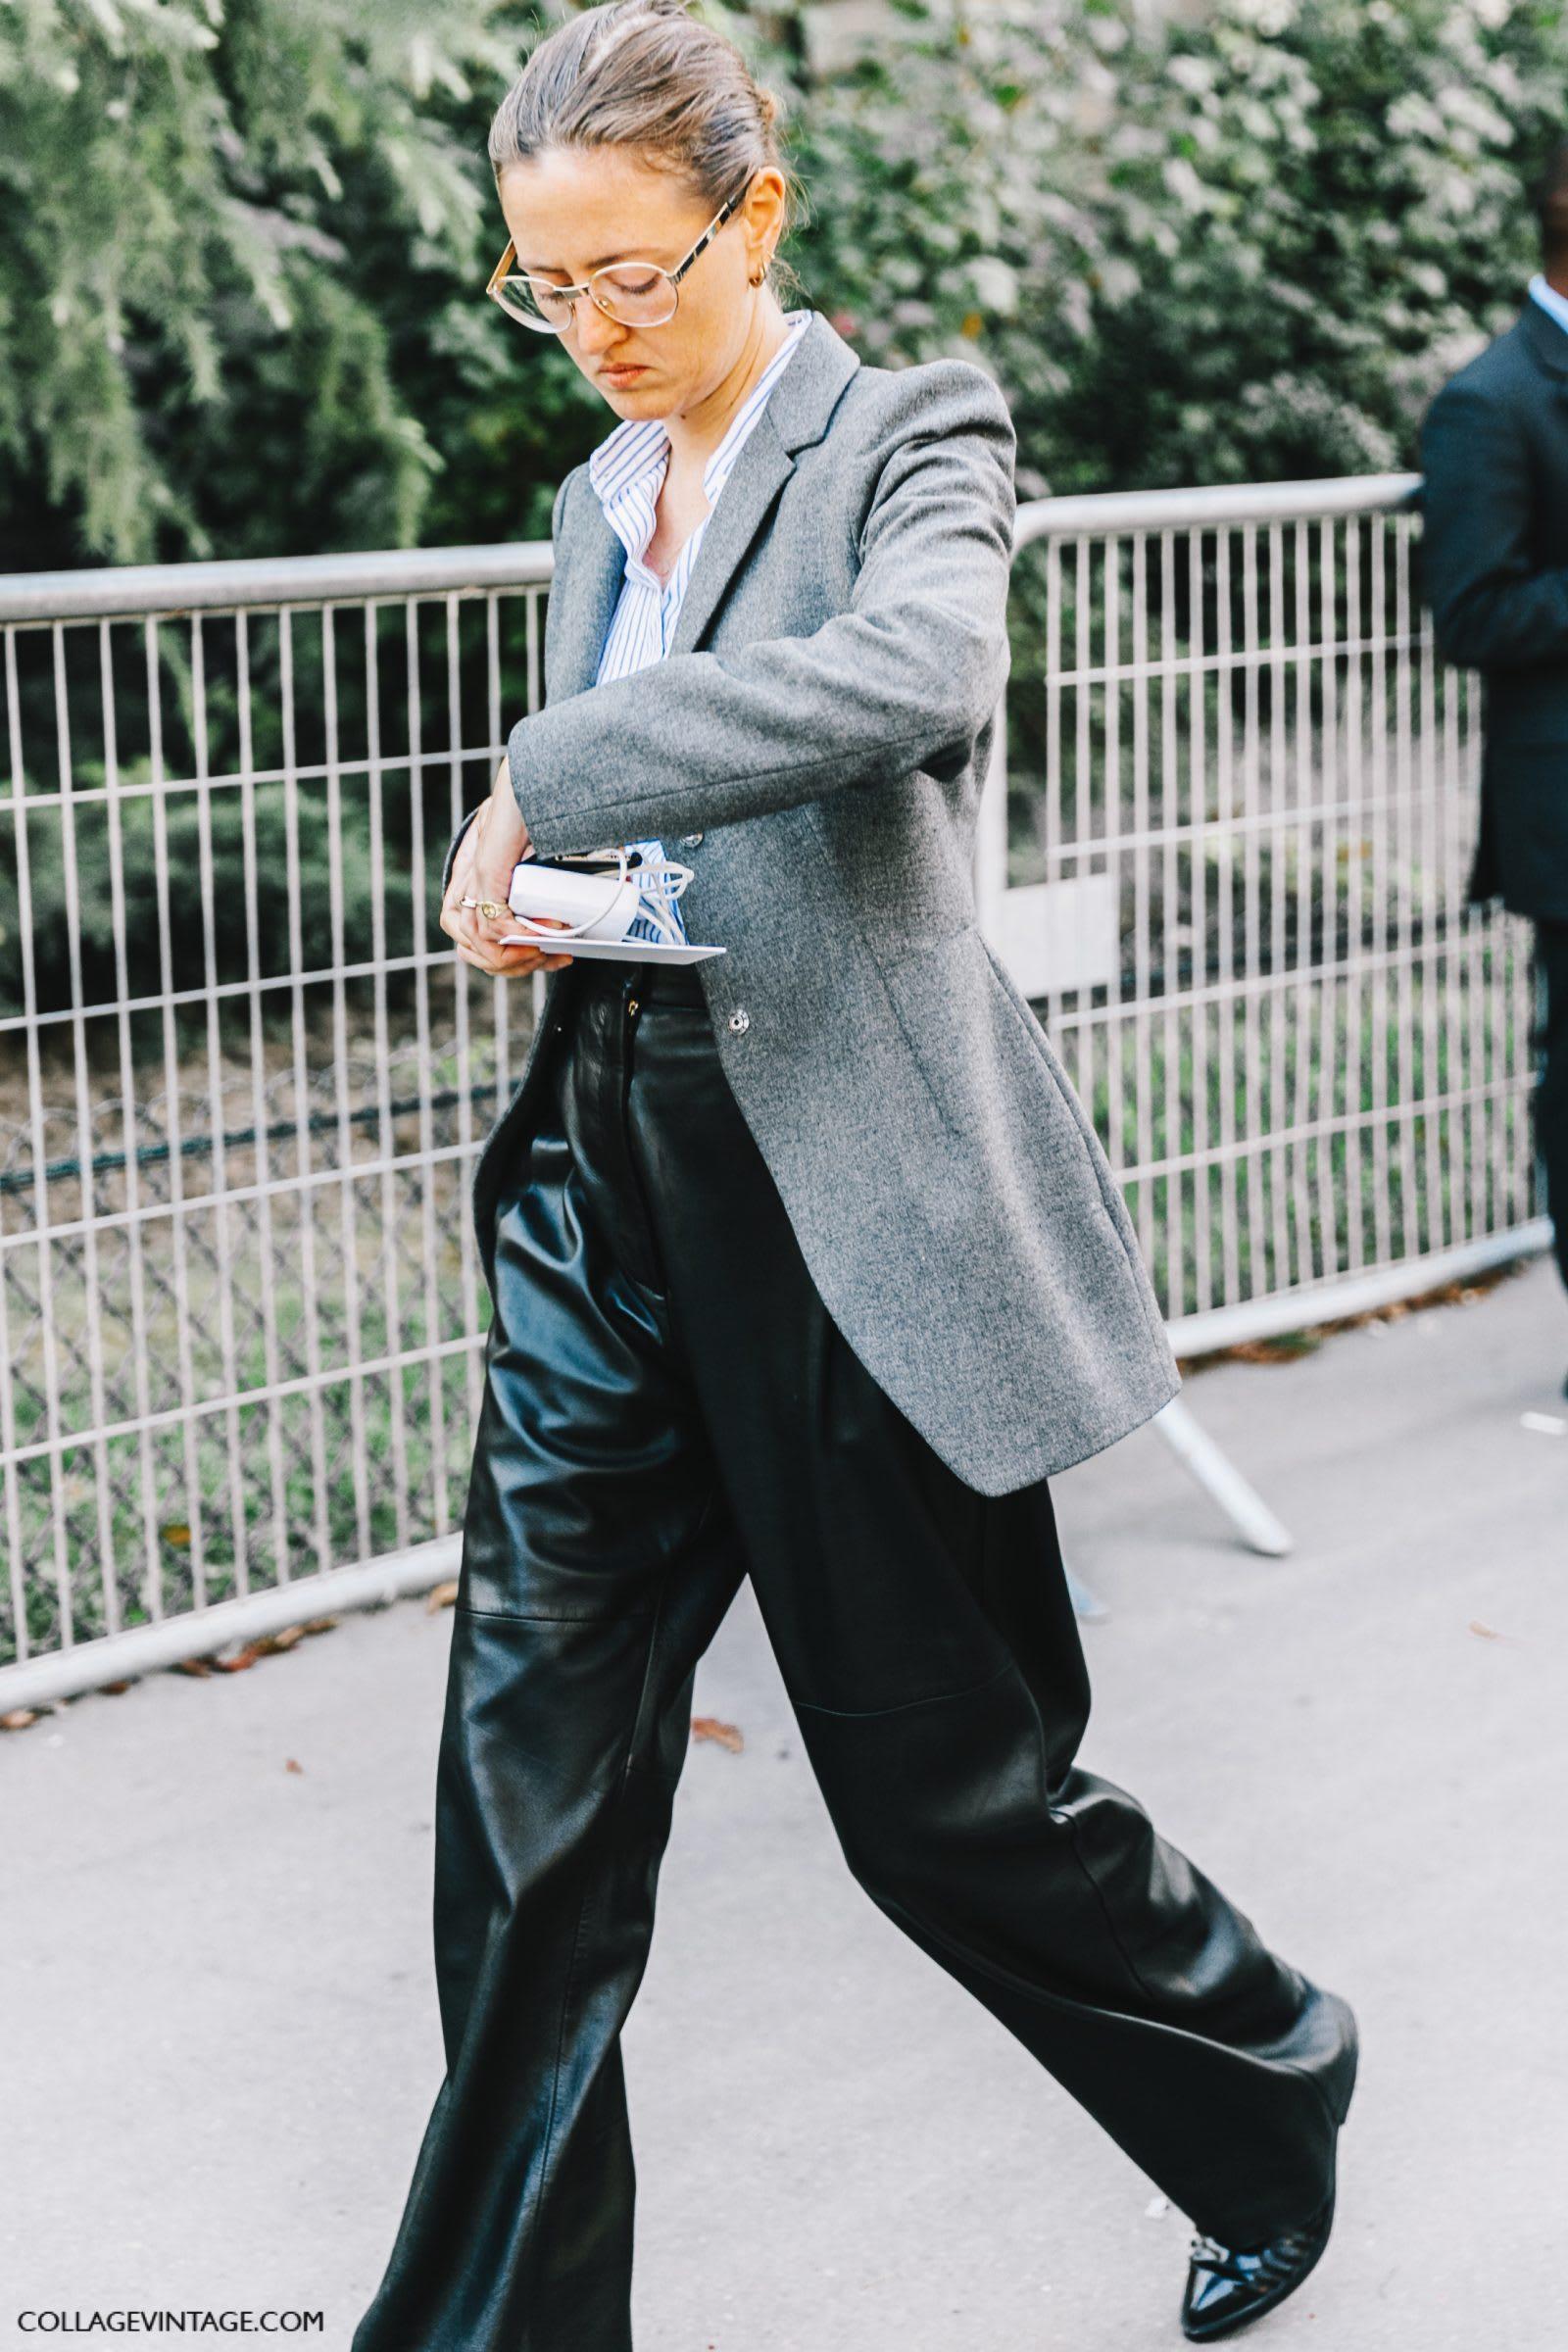 版 型 相 對 硬 挺 的 皮 革 材 質 。 圖 片 來 源 :blue is in fashion this year。